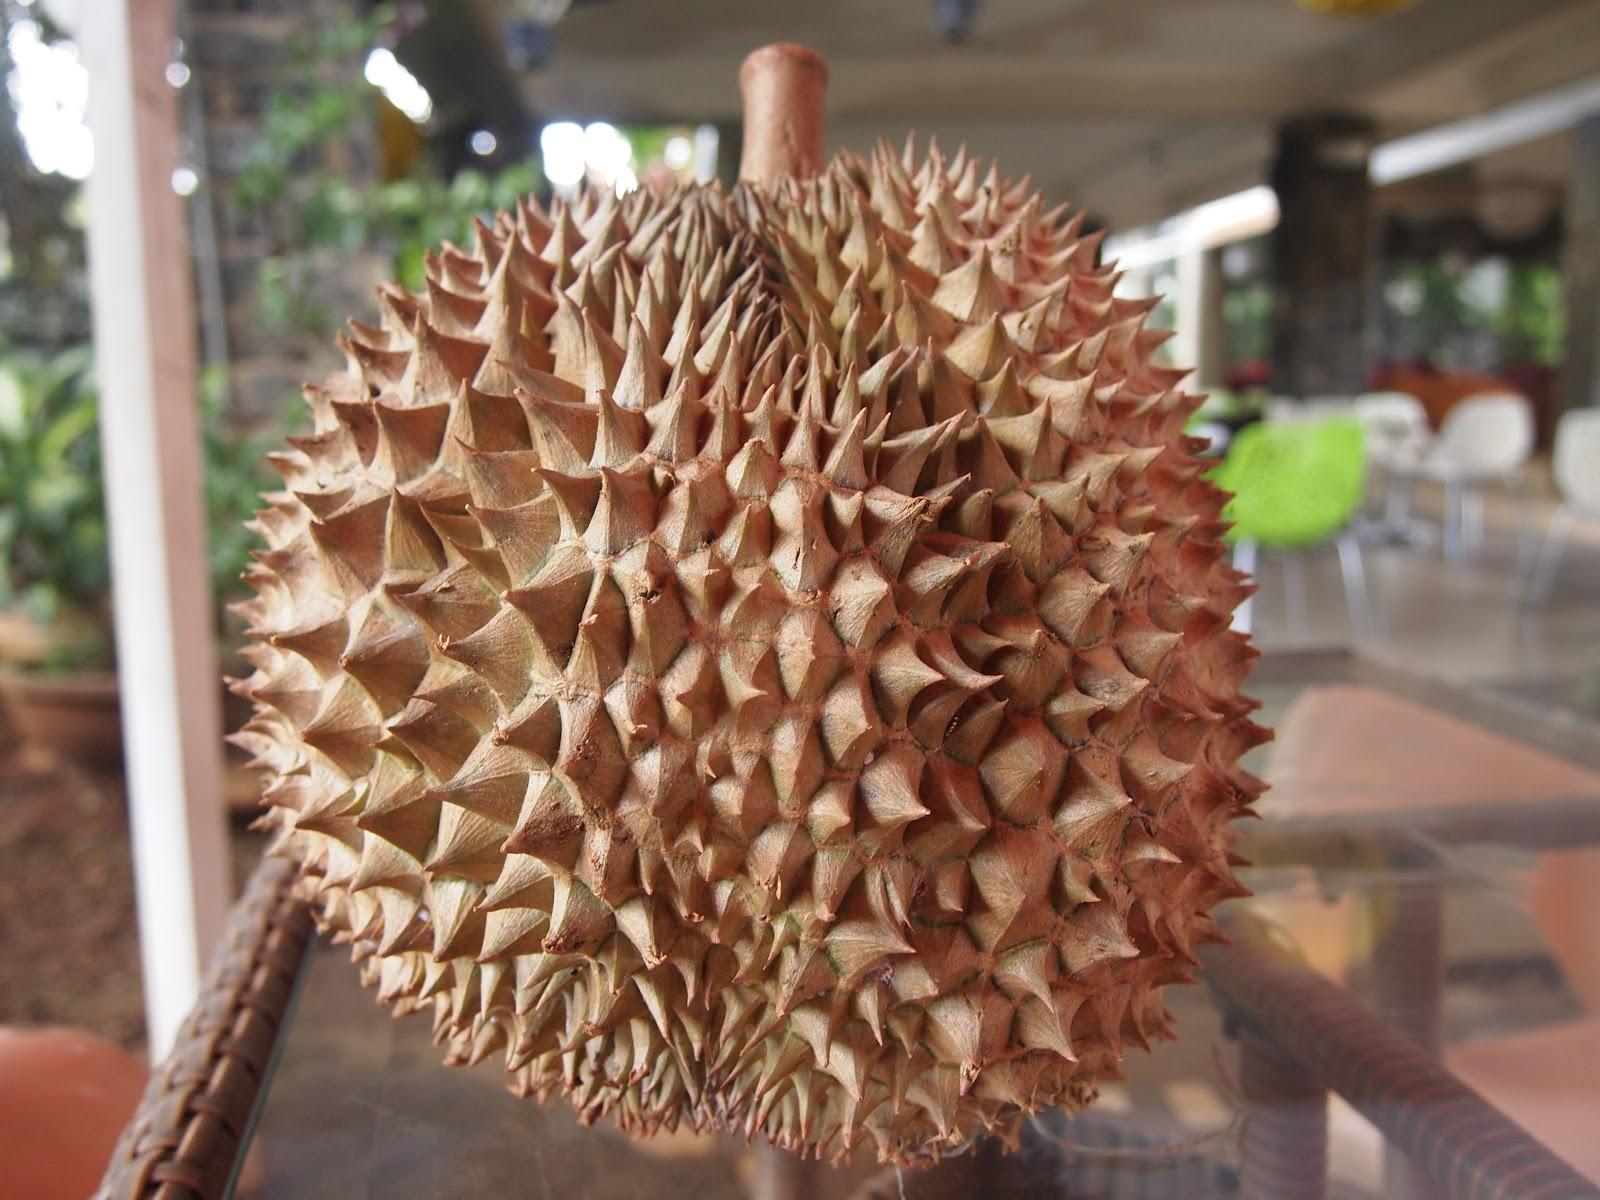 vietnam durian varieties. Black Bedroom Furniture Sets. Home Design Ideas